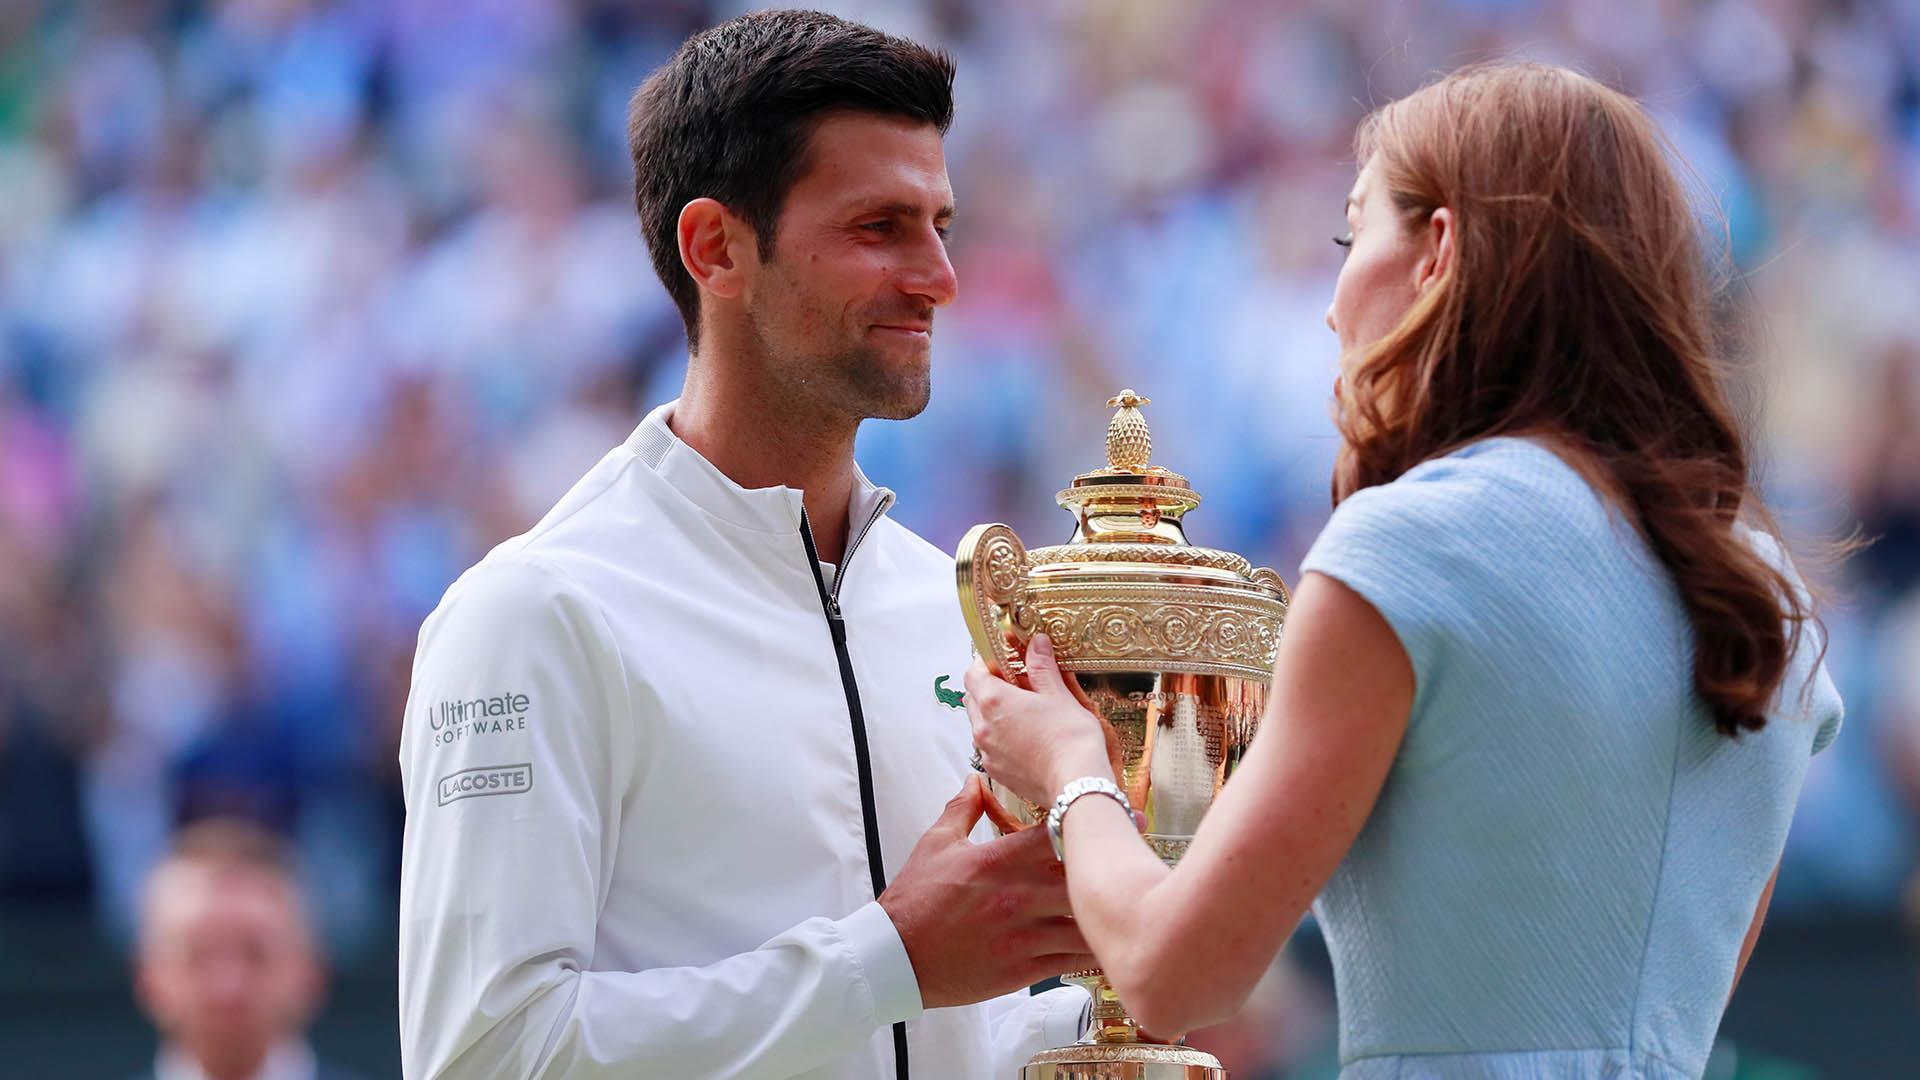 Kate Middleton le entrega el trofeo a Djokovic (REUTERS)